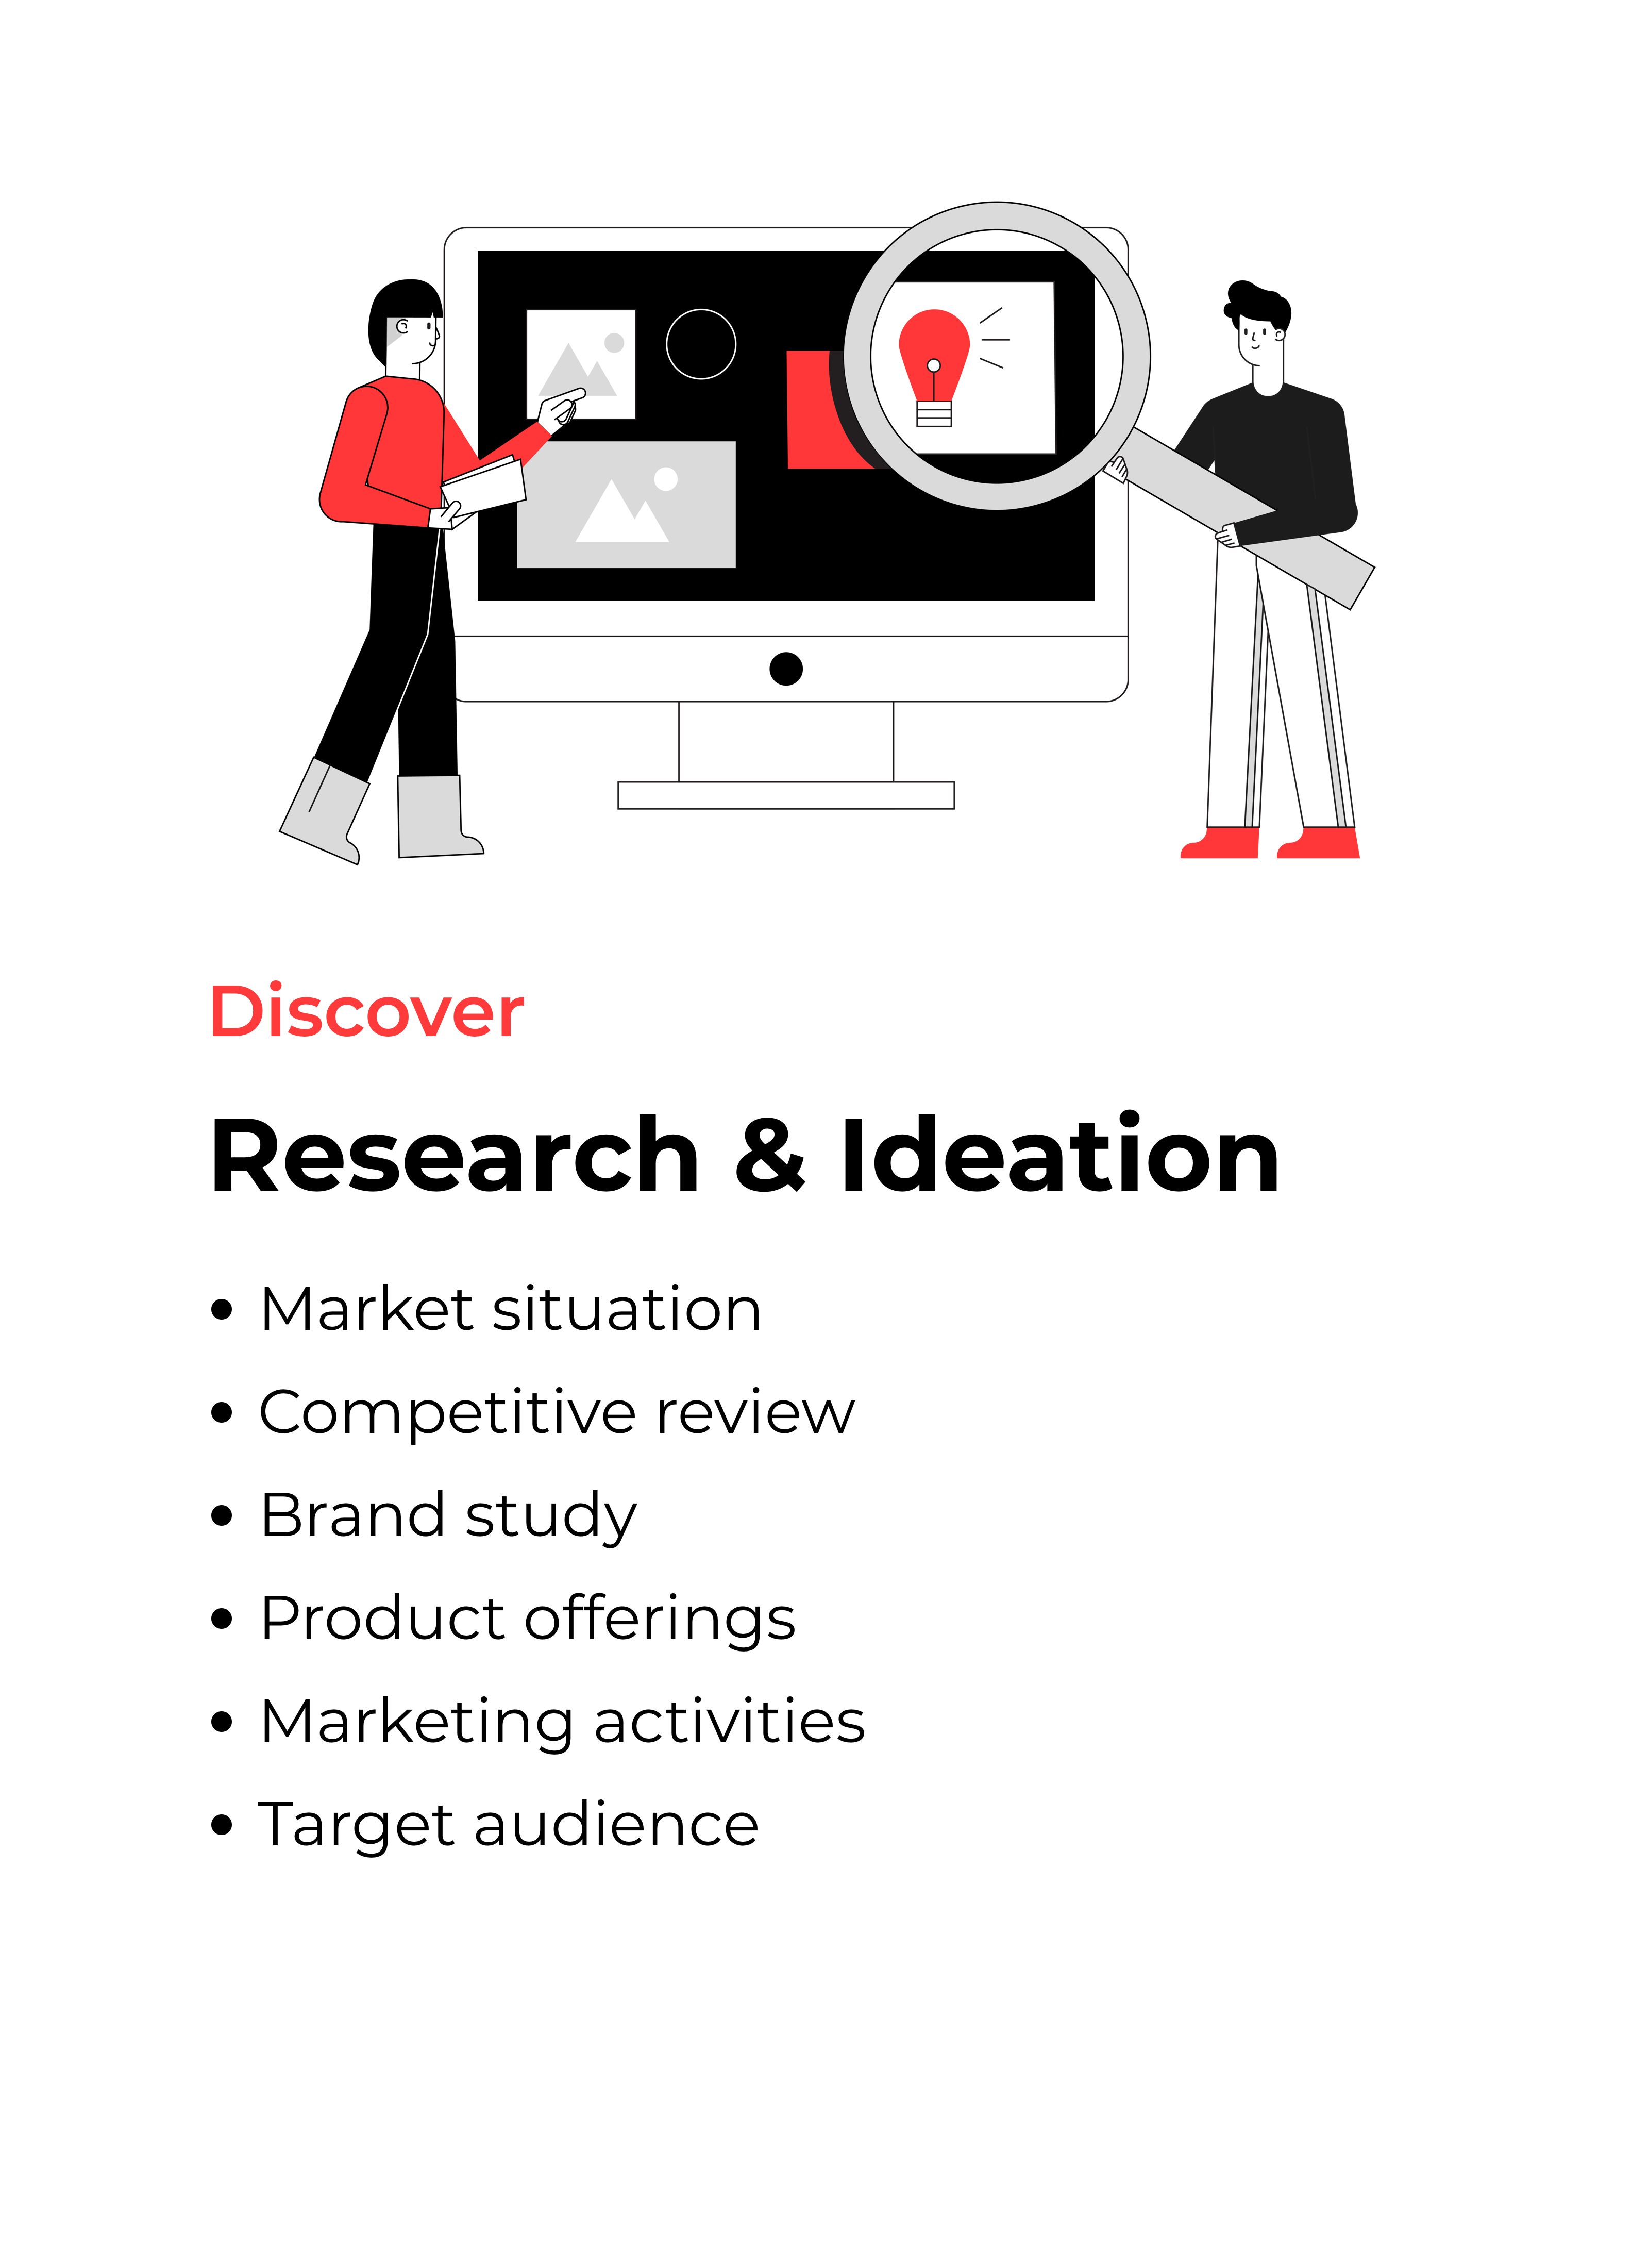 Effective design_Discover